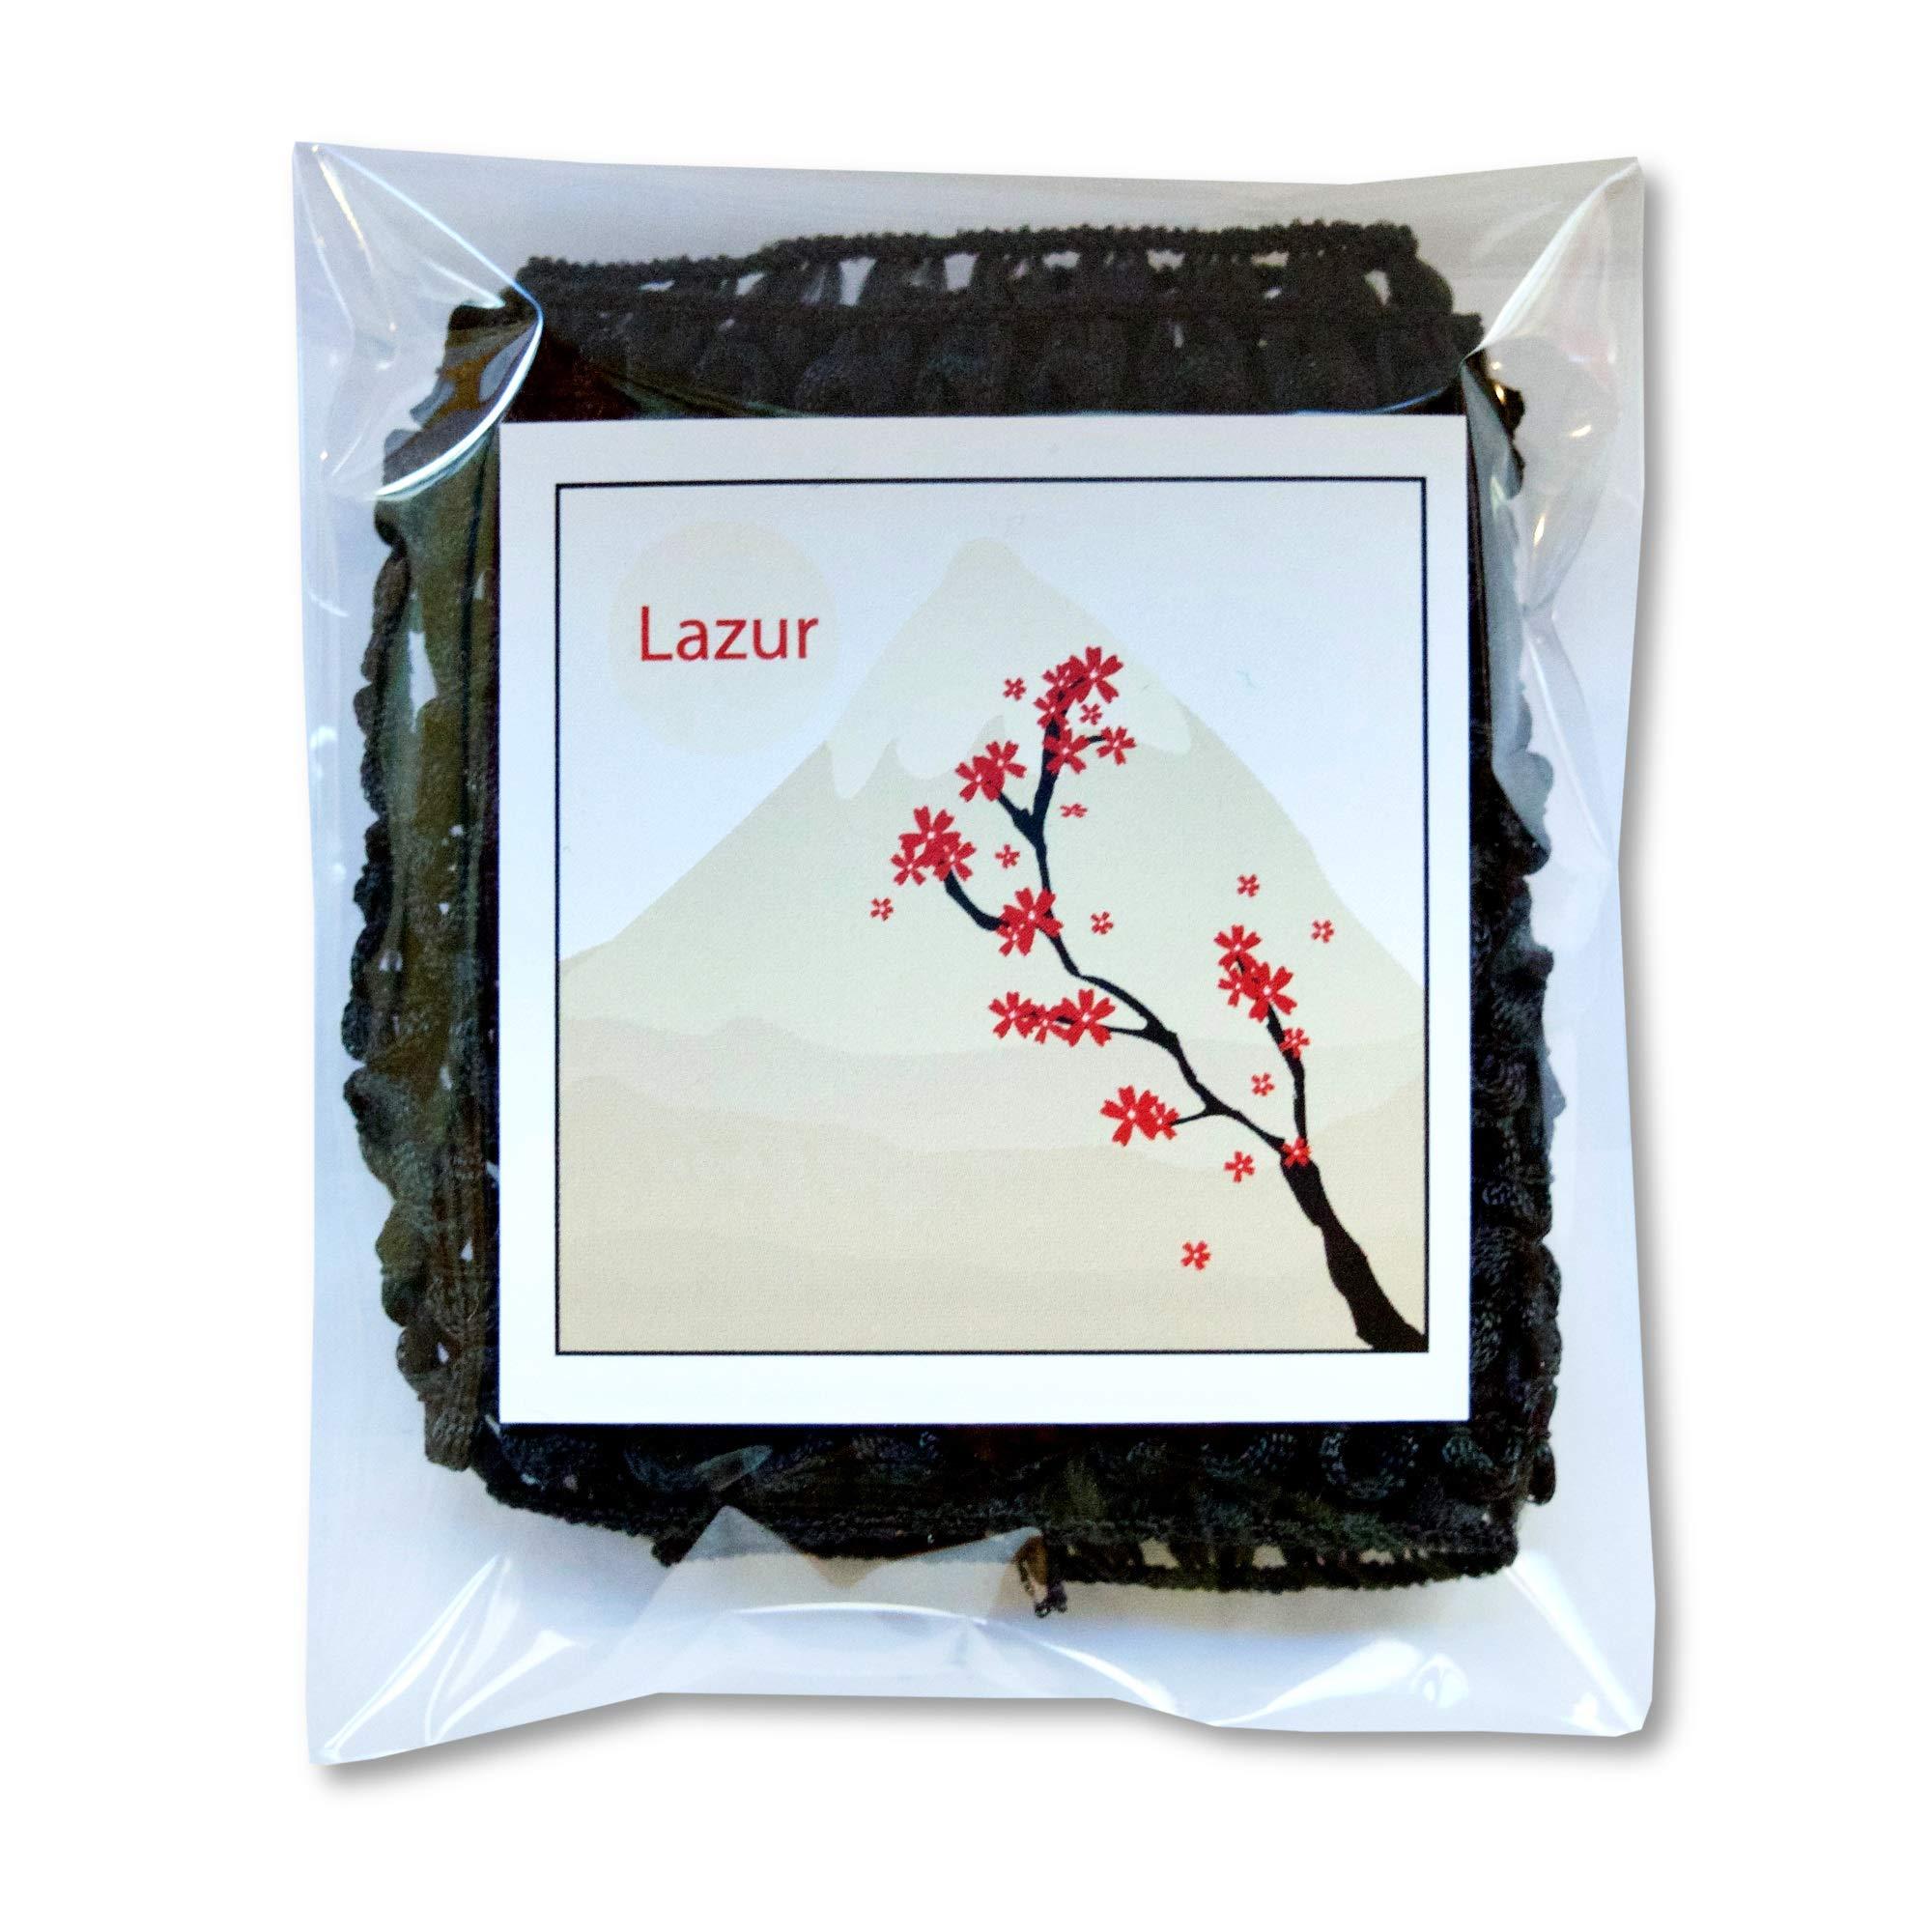 Kao MEGURISM Health Care Steam Warm Eye Mask, Made in Japan, Lavender Sage 12 Sheets and Lazur hair band, Black